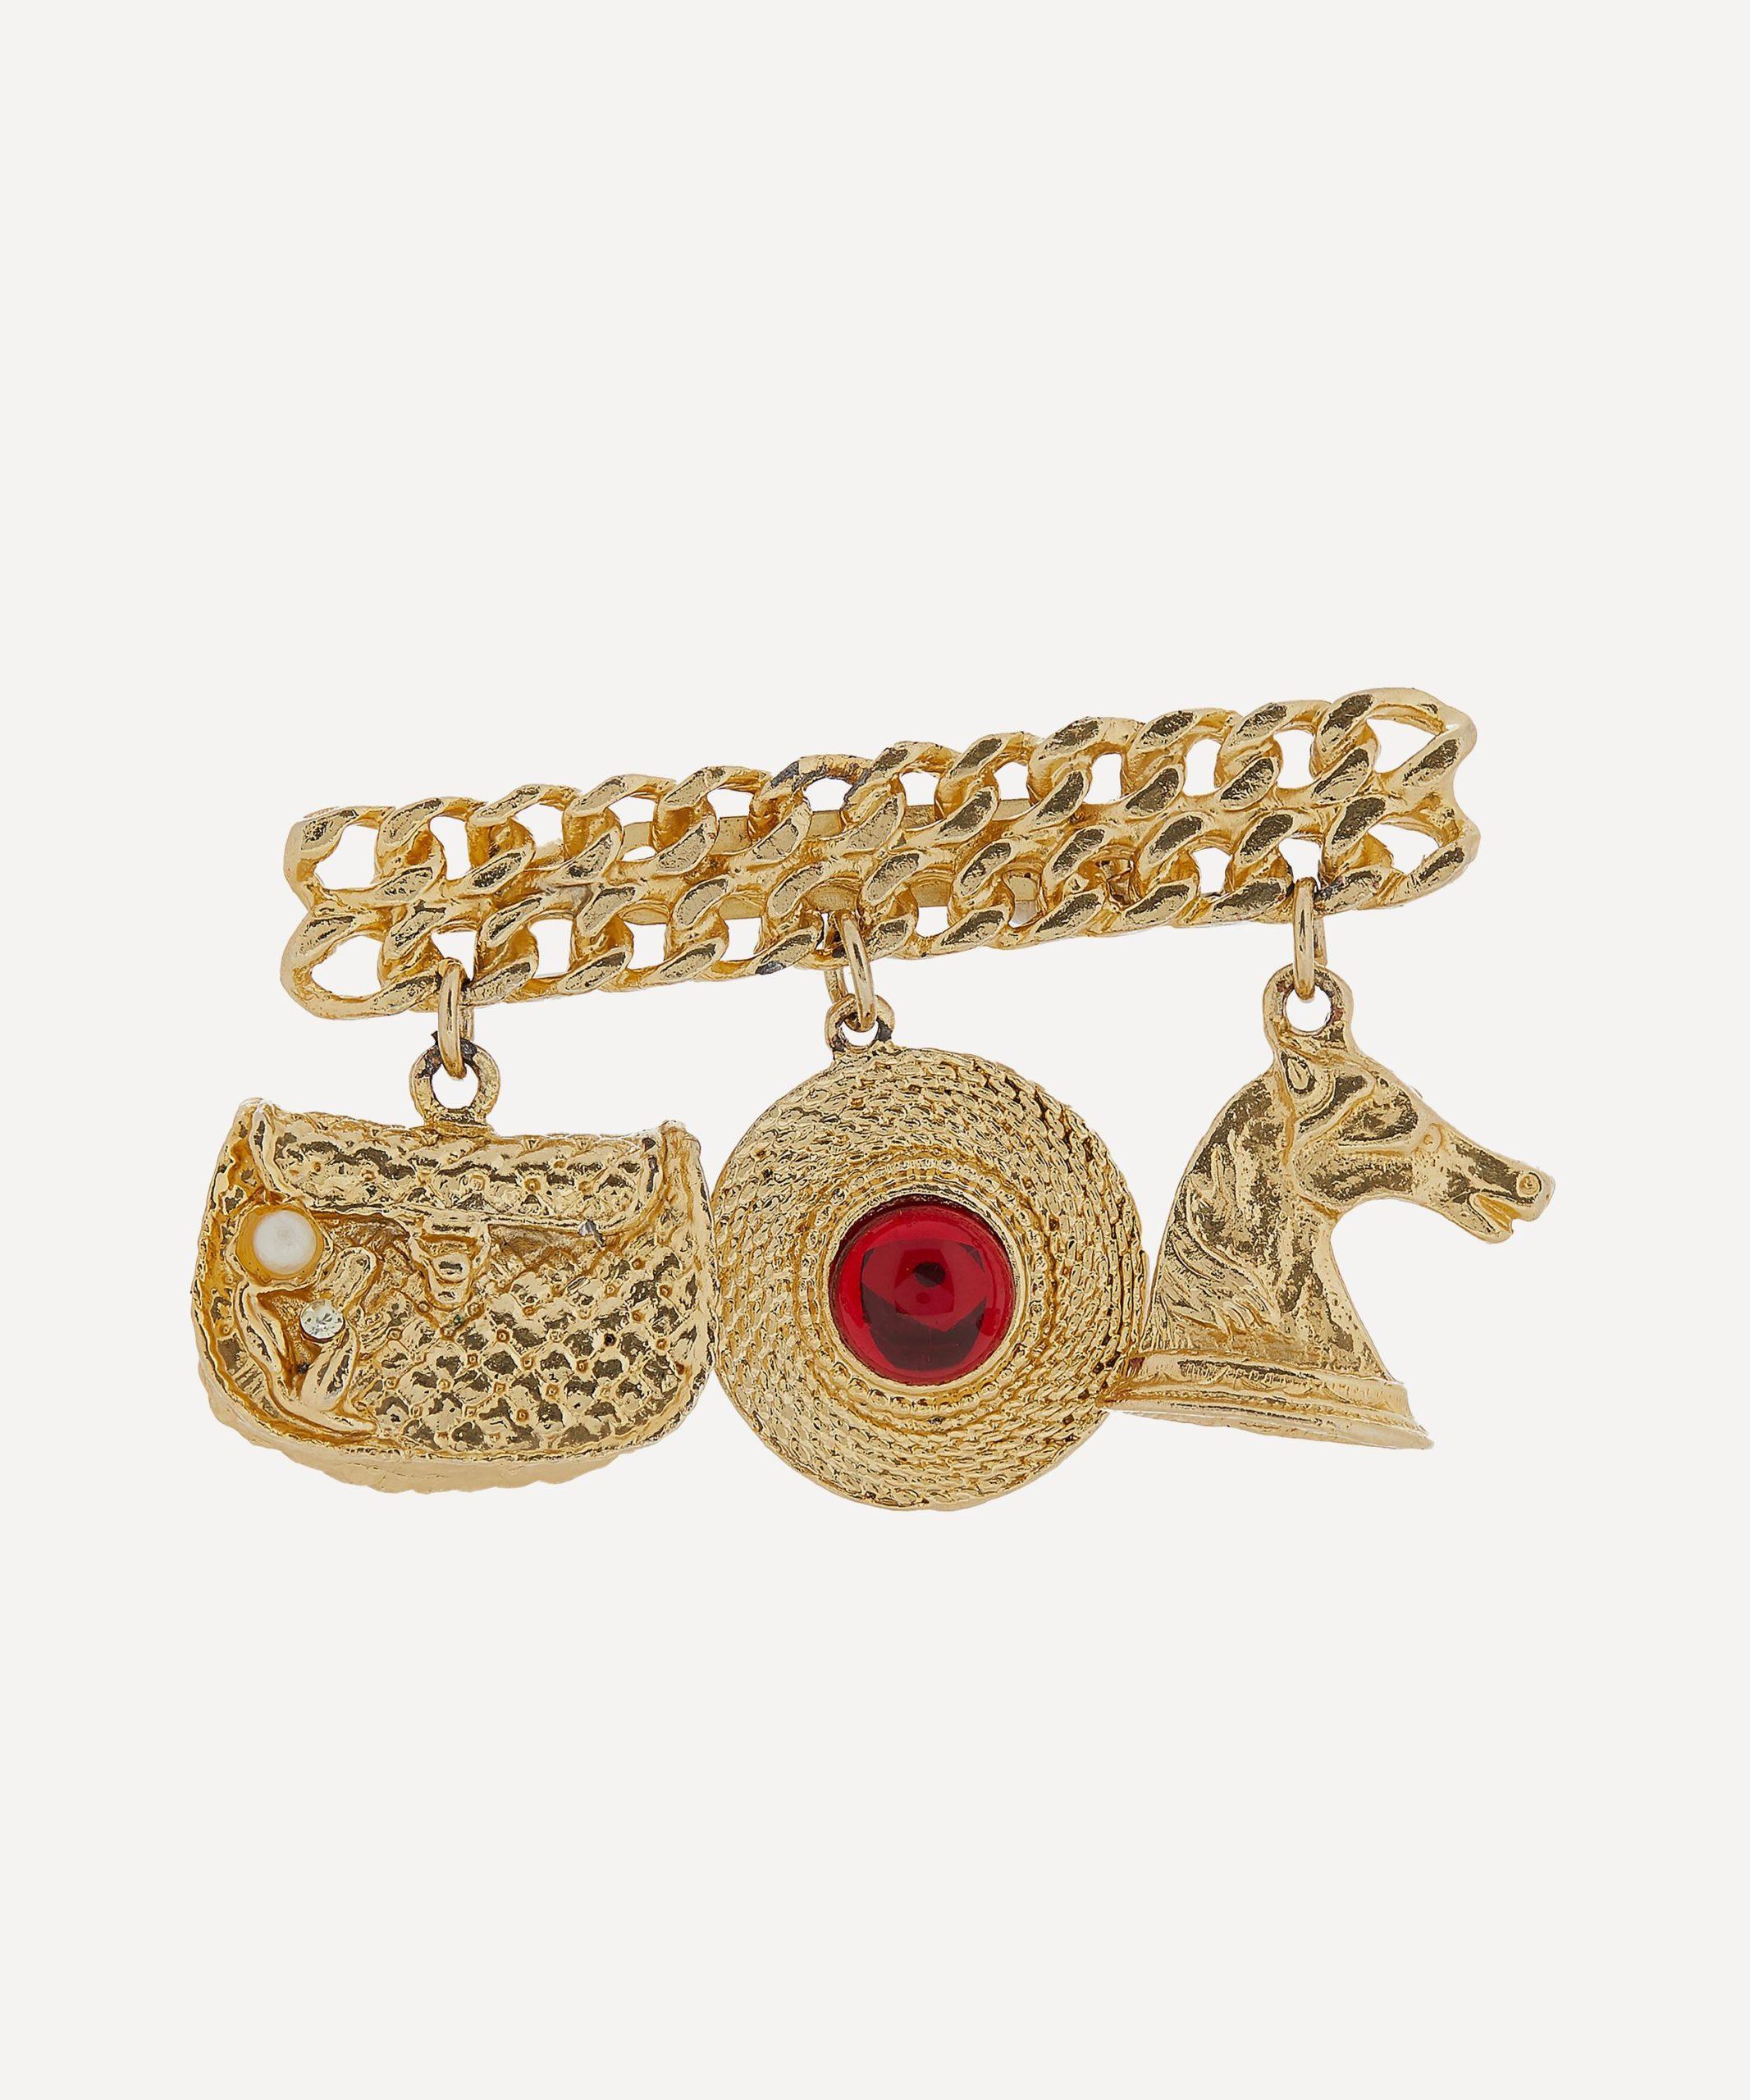 best-july-birthstone-jewellery-for-july-birthdays-ruby-charm-brooch-liberty